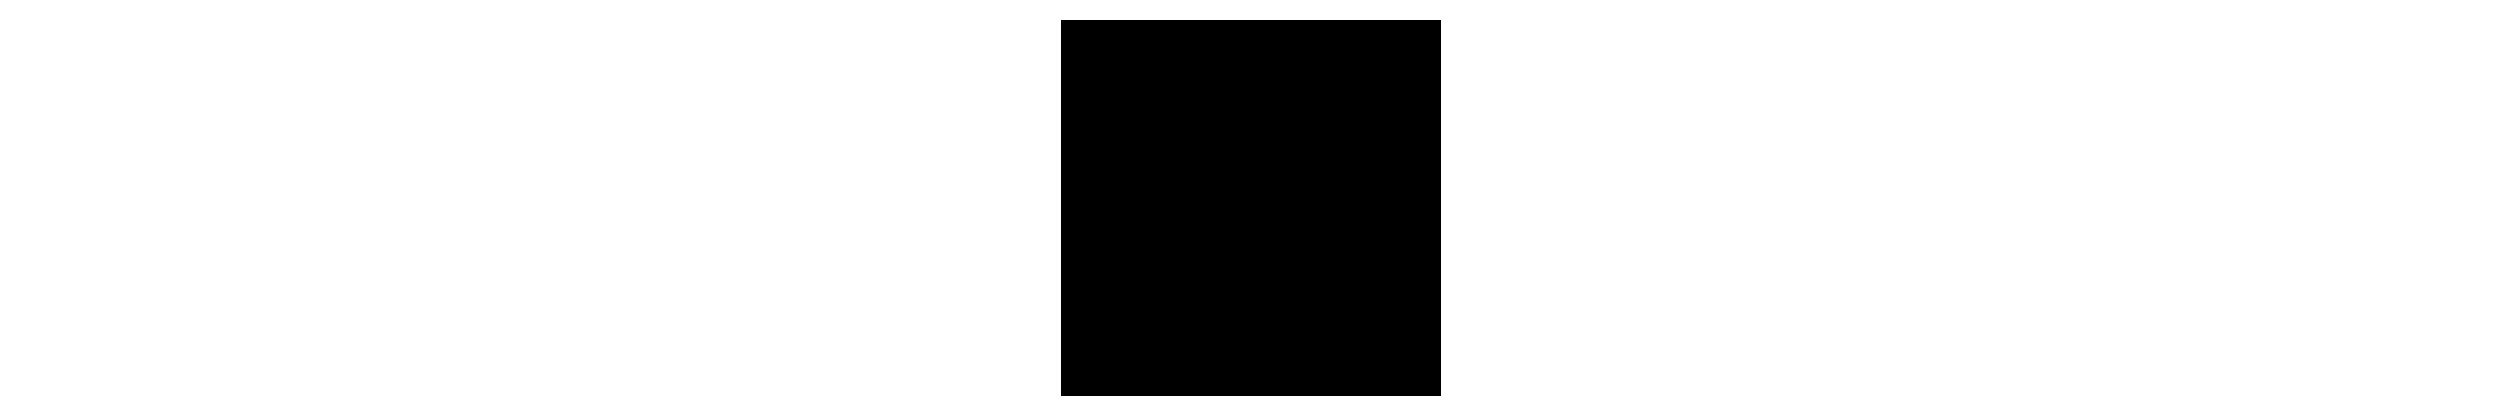 little-logo.png